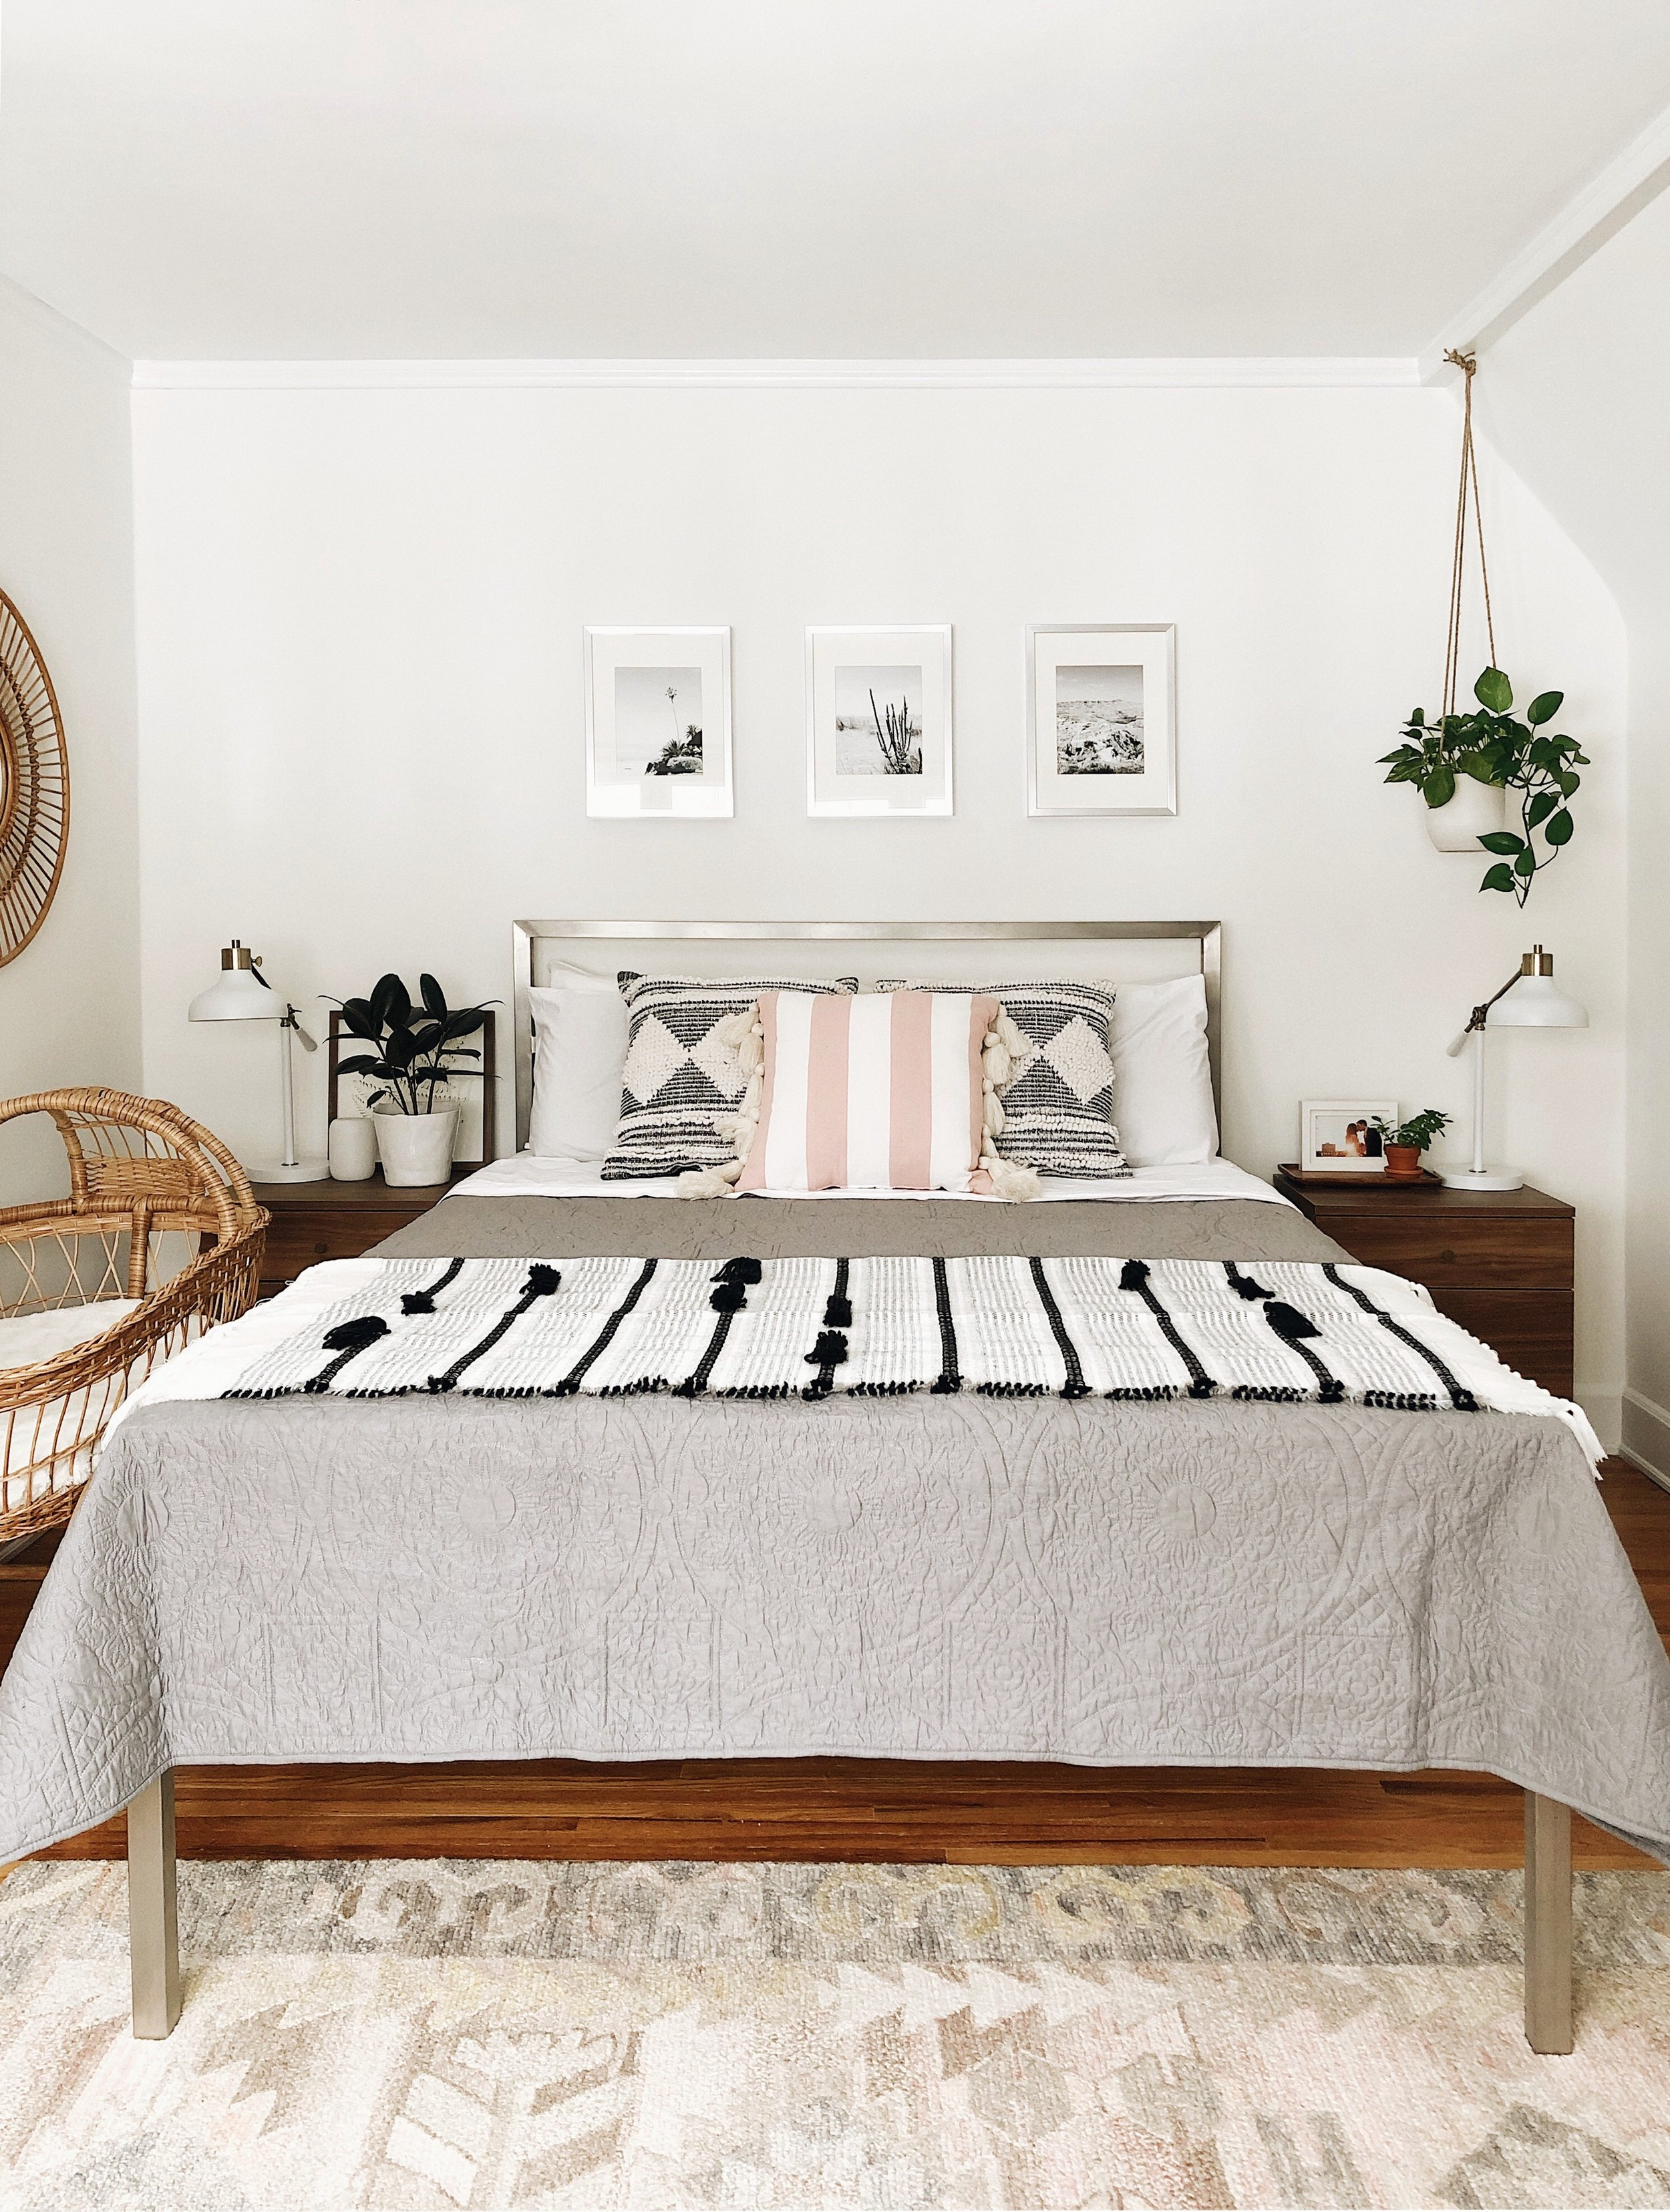 similar bed frame for less  here    rug  here